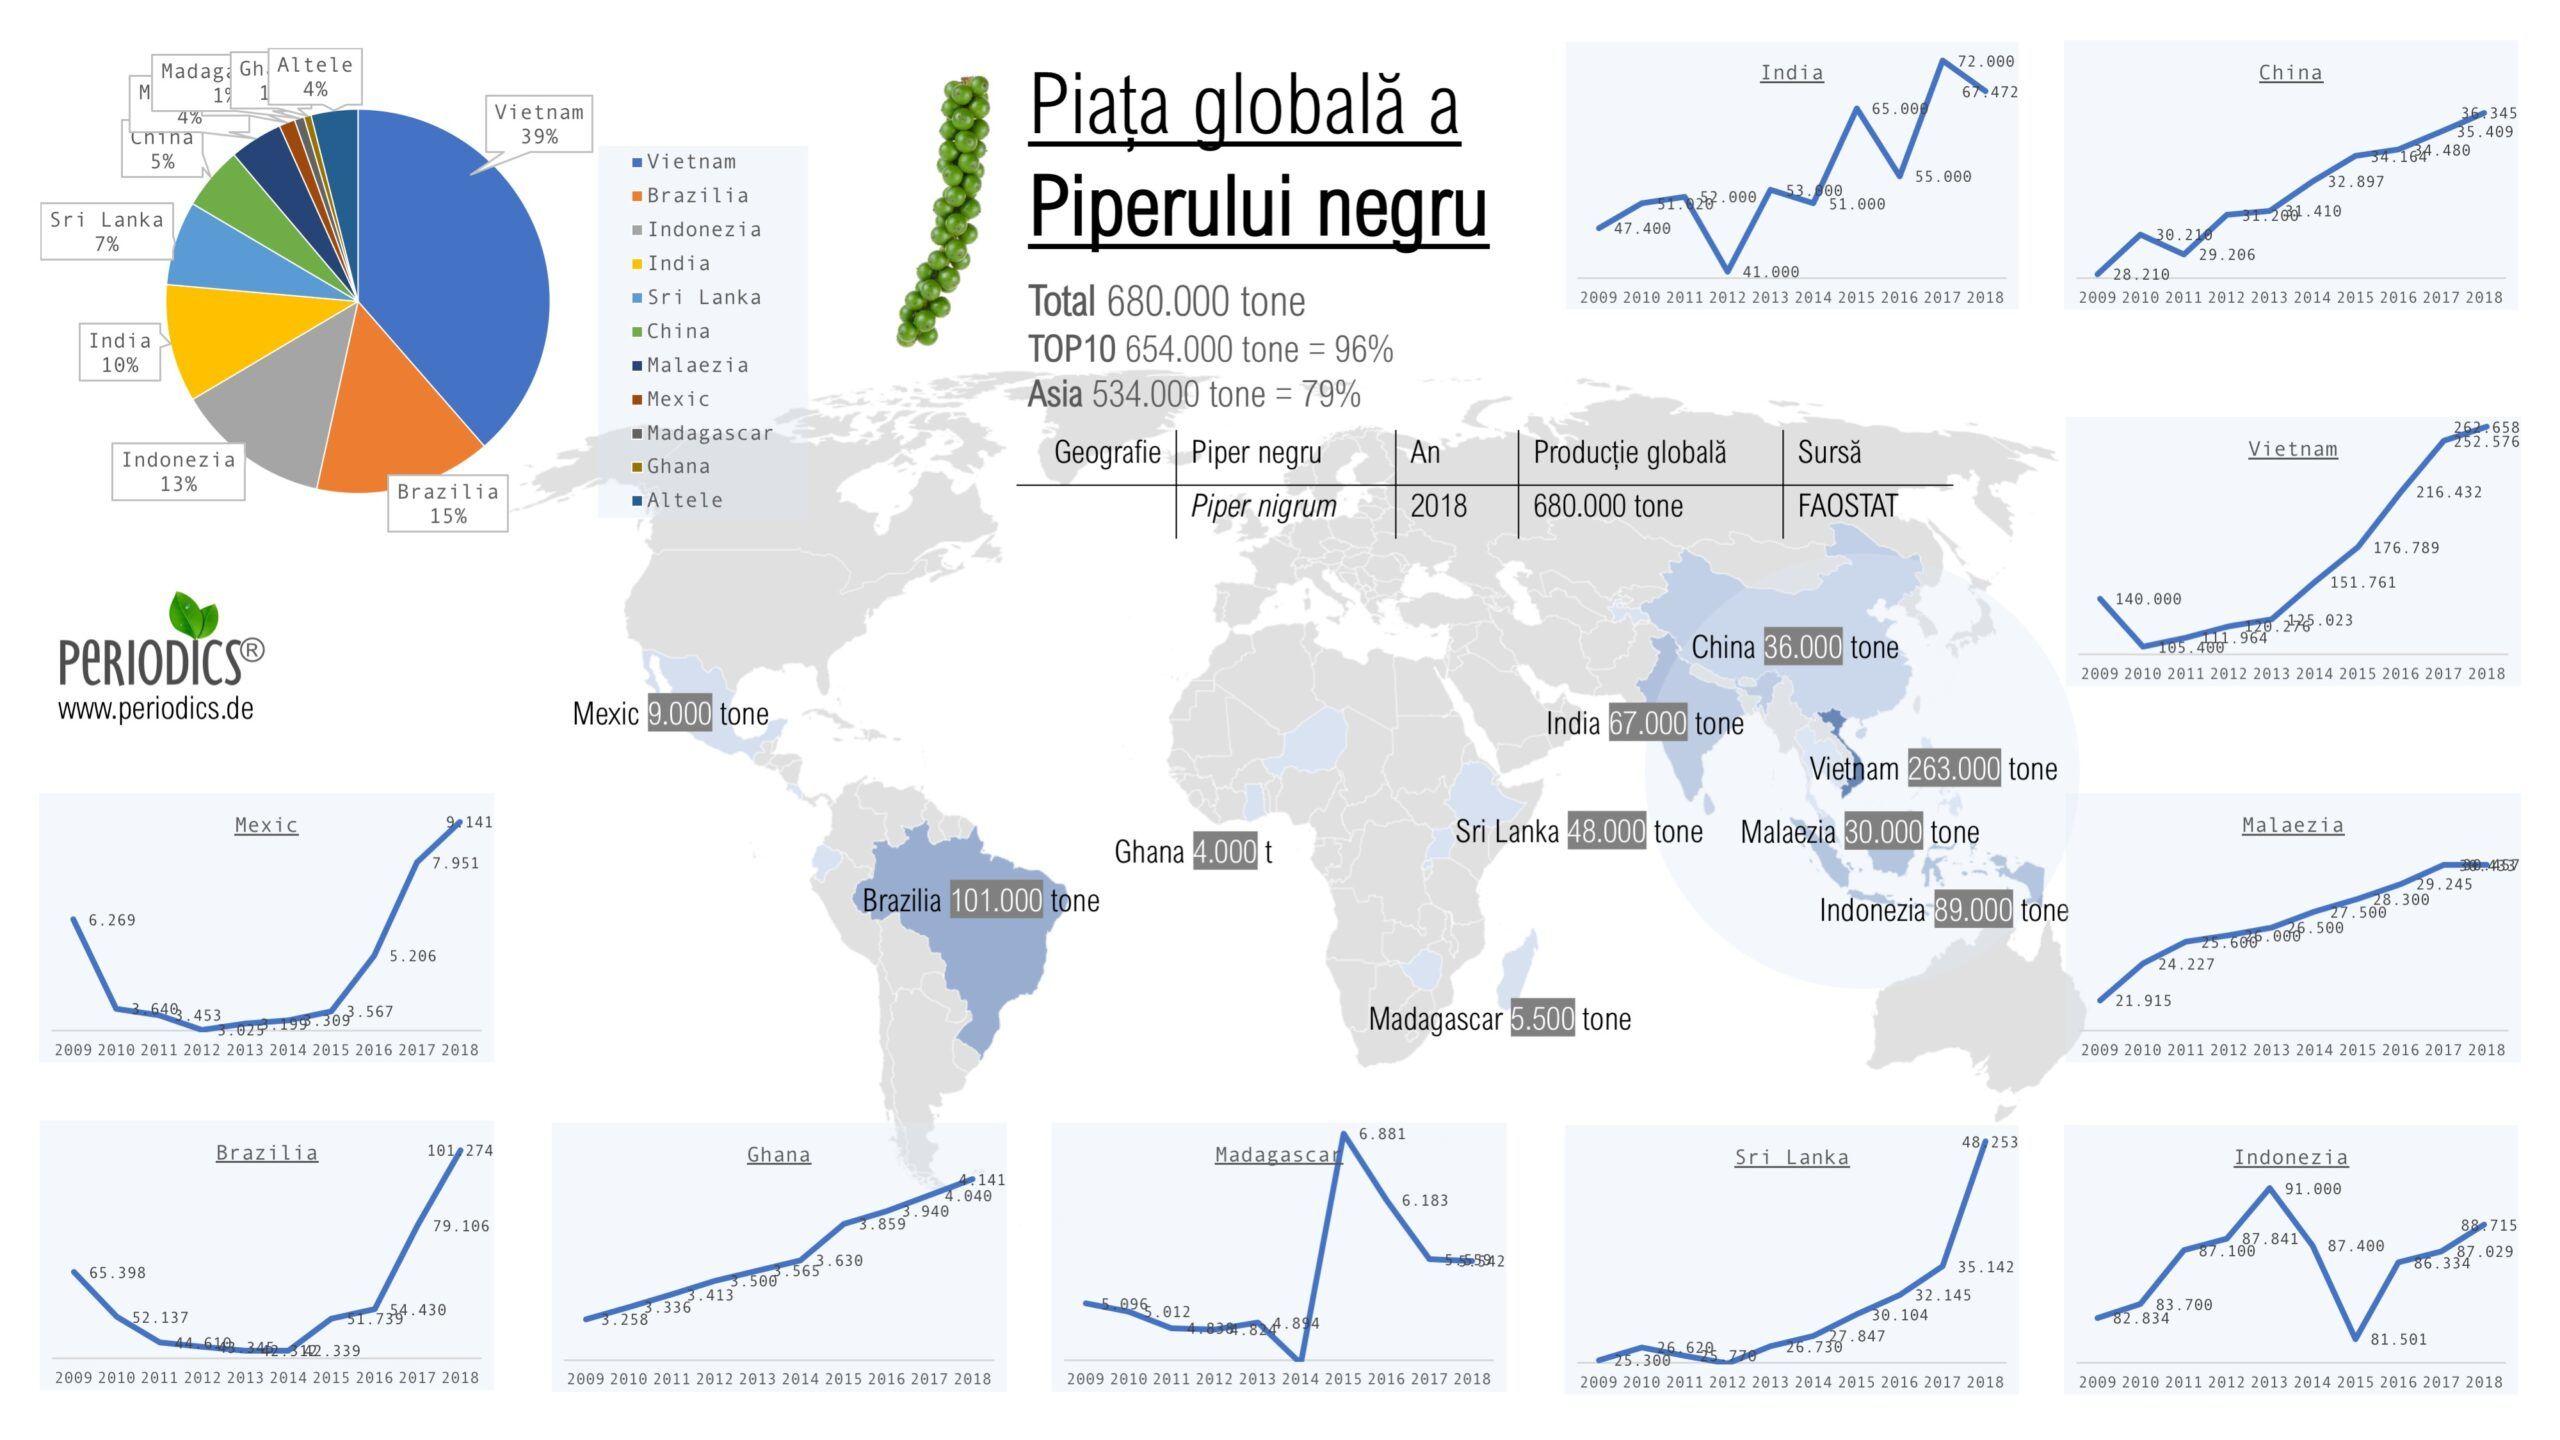 "<span itemprop=""name"">Piata globala a piperului negru – Infografic (ro_RO)</span>"